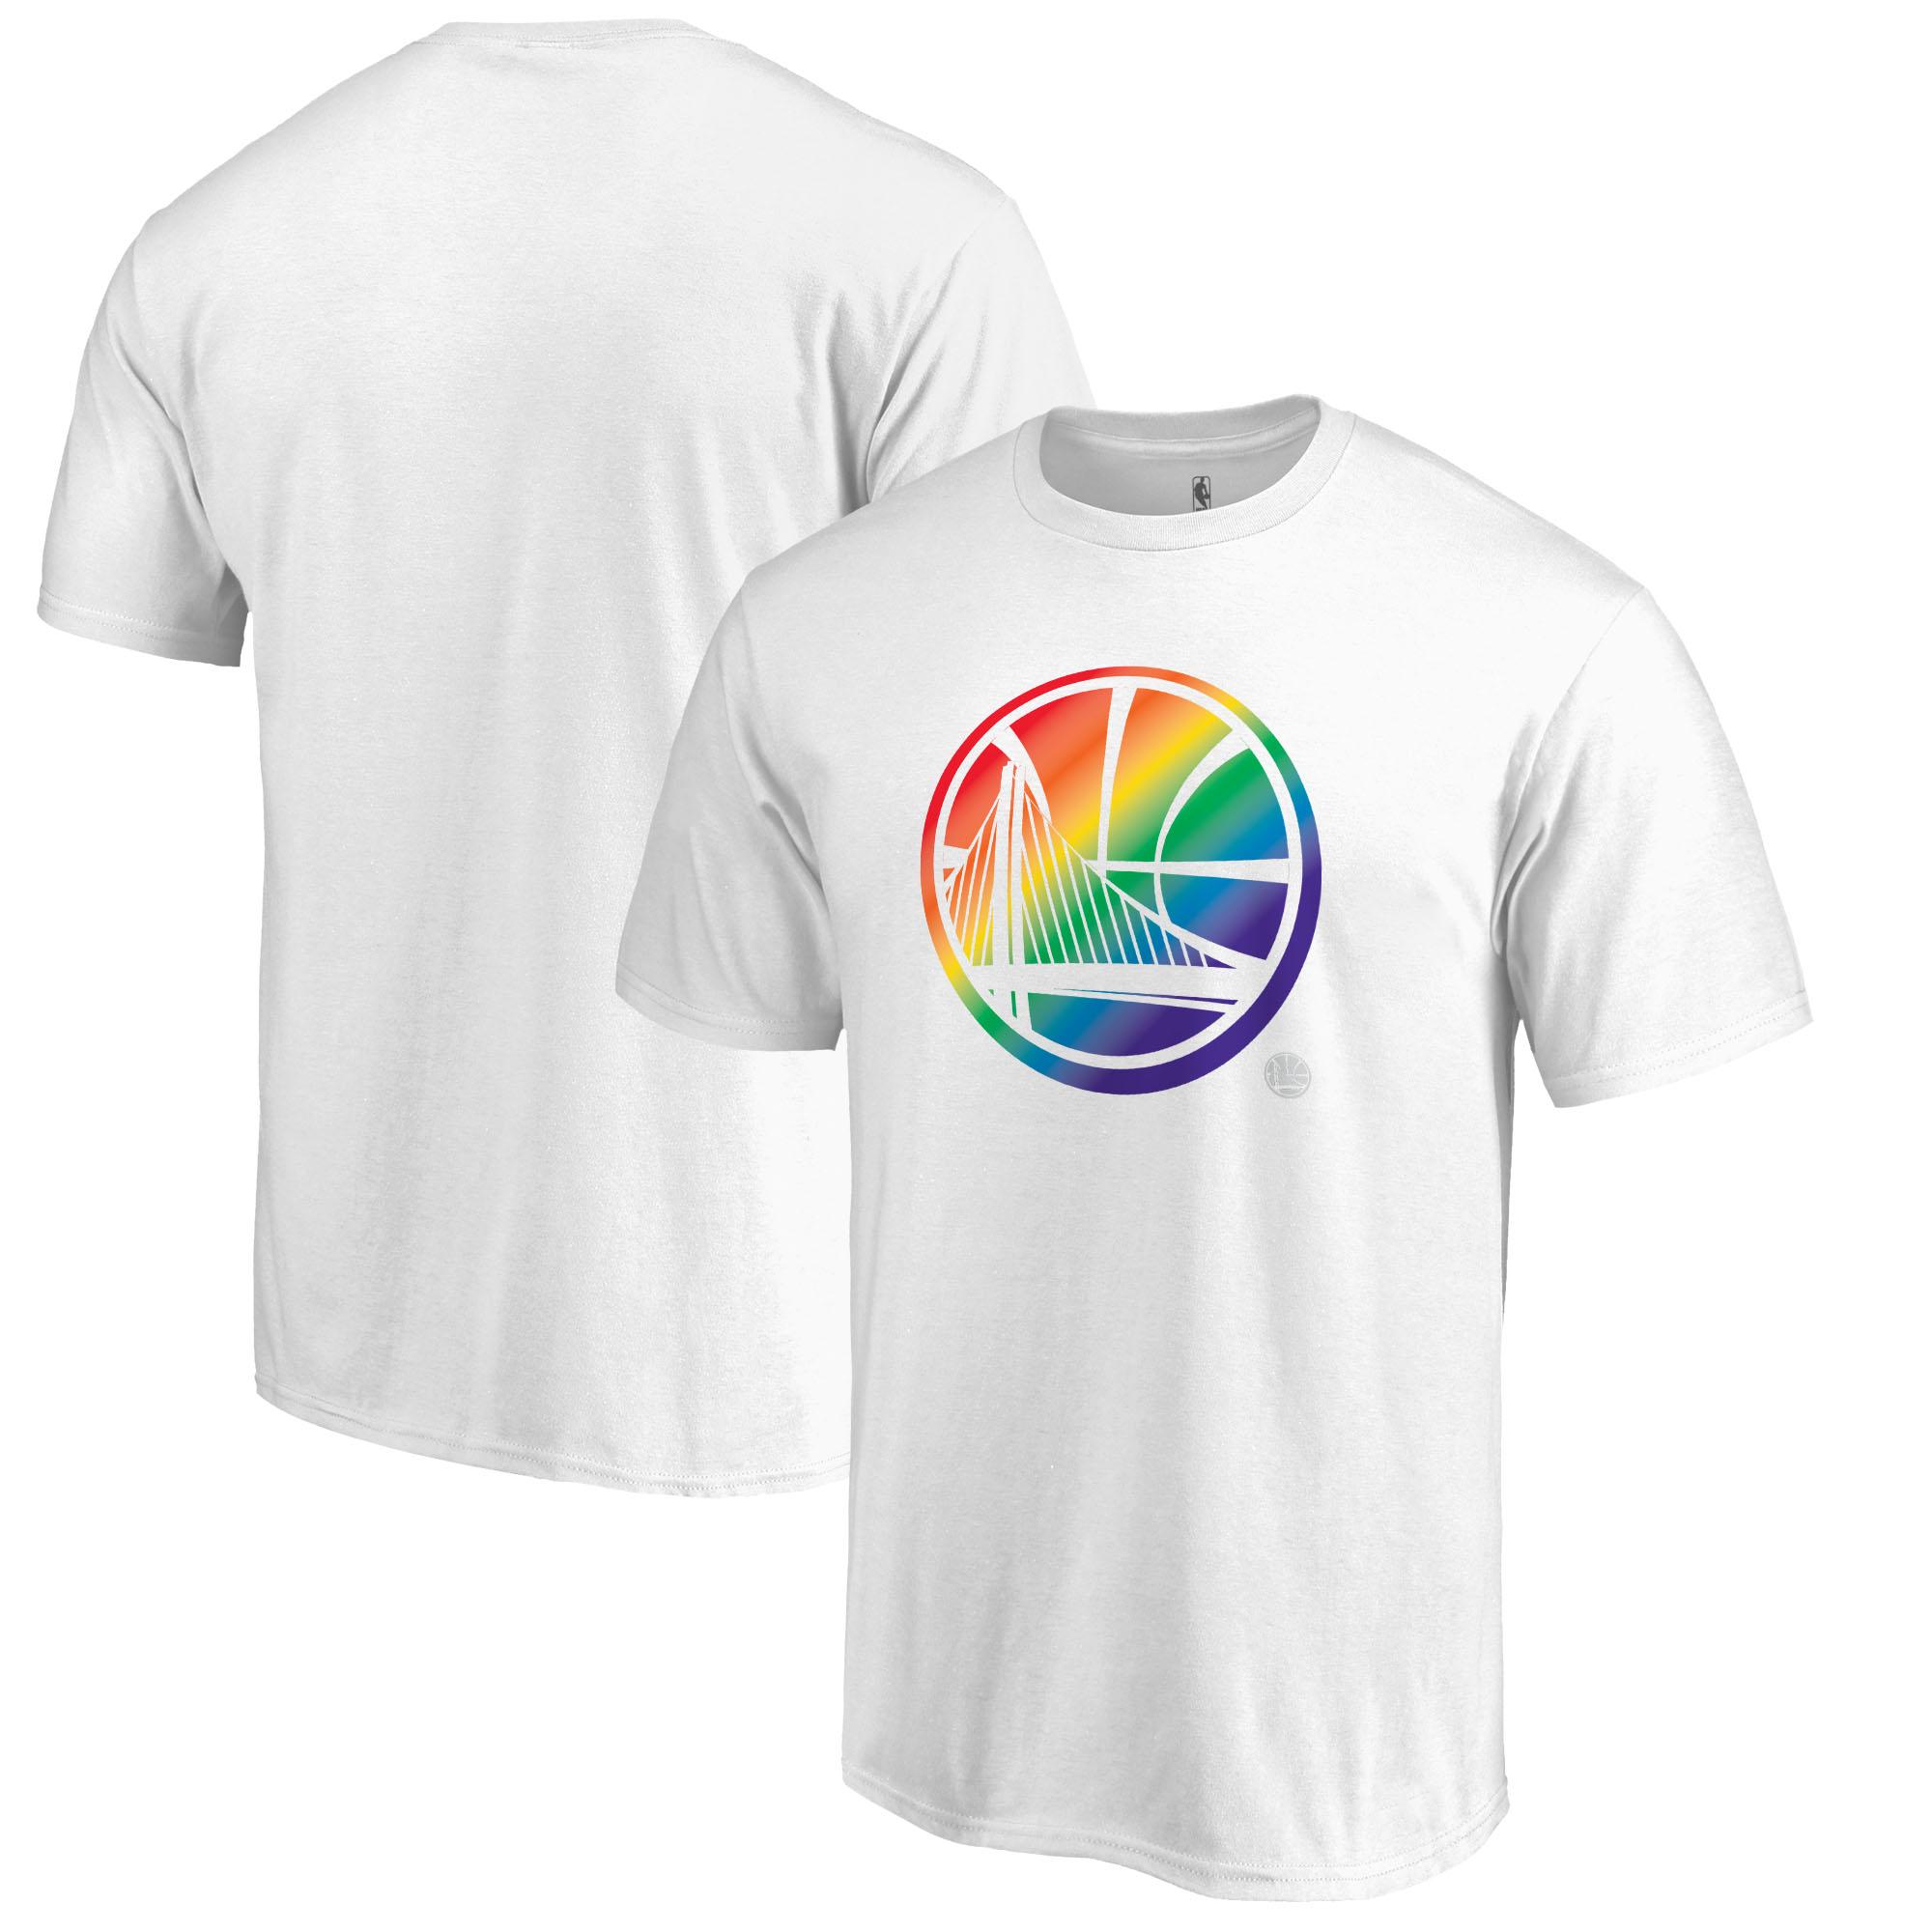 Golden State Warriors Fanatics Branded Team Pride T-Shirt - White